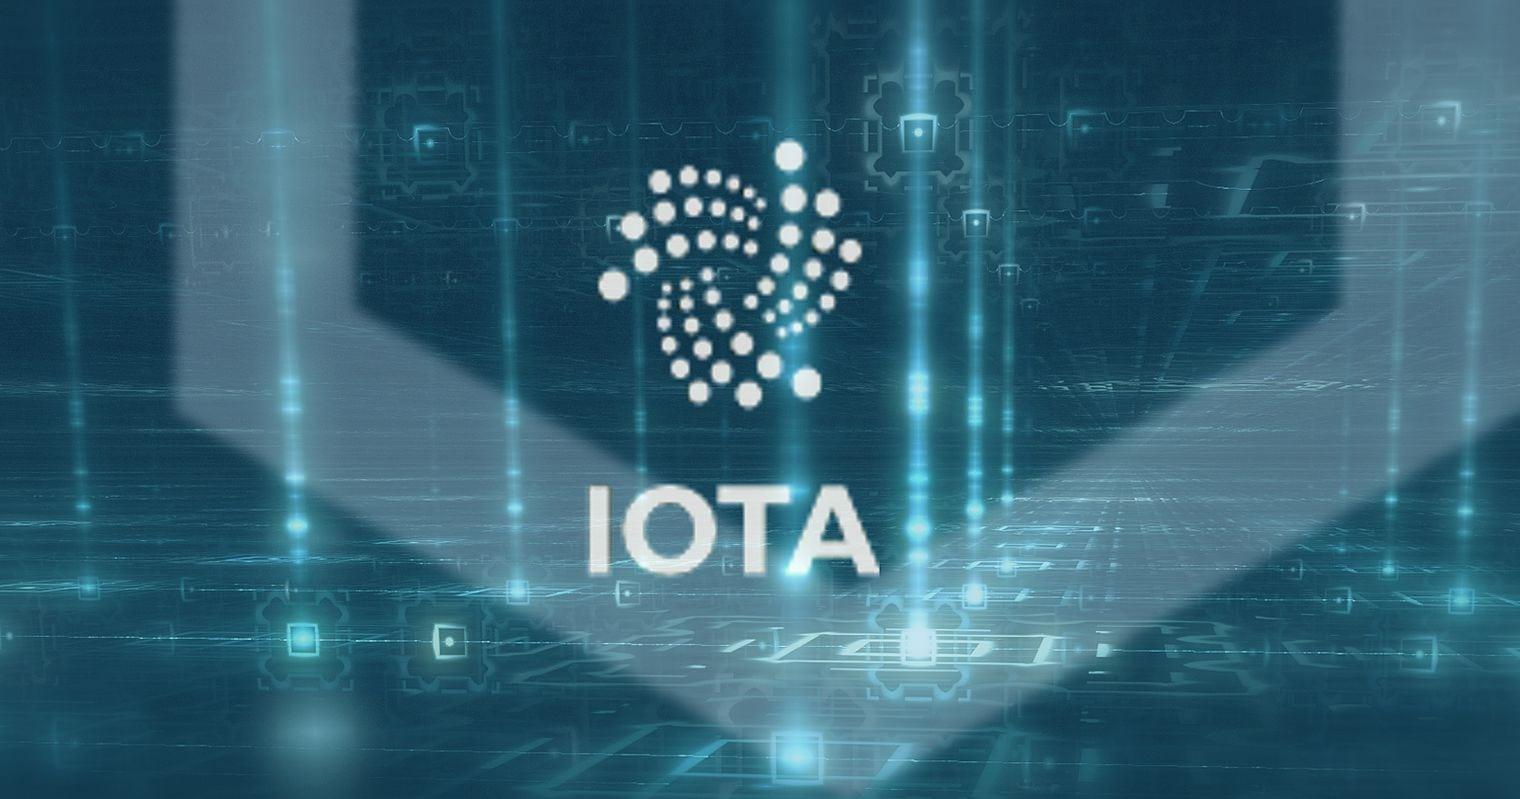 iota - IOTA (MIOTA) Begins Q1 2019 With Partnership From Two Giant Firms